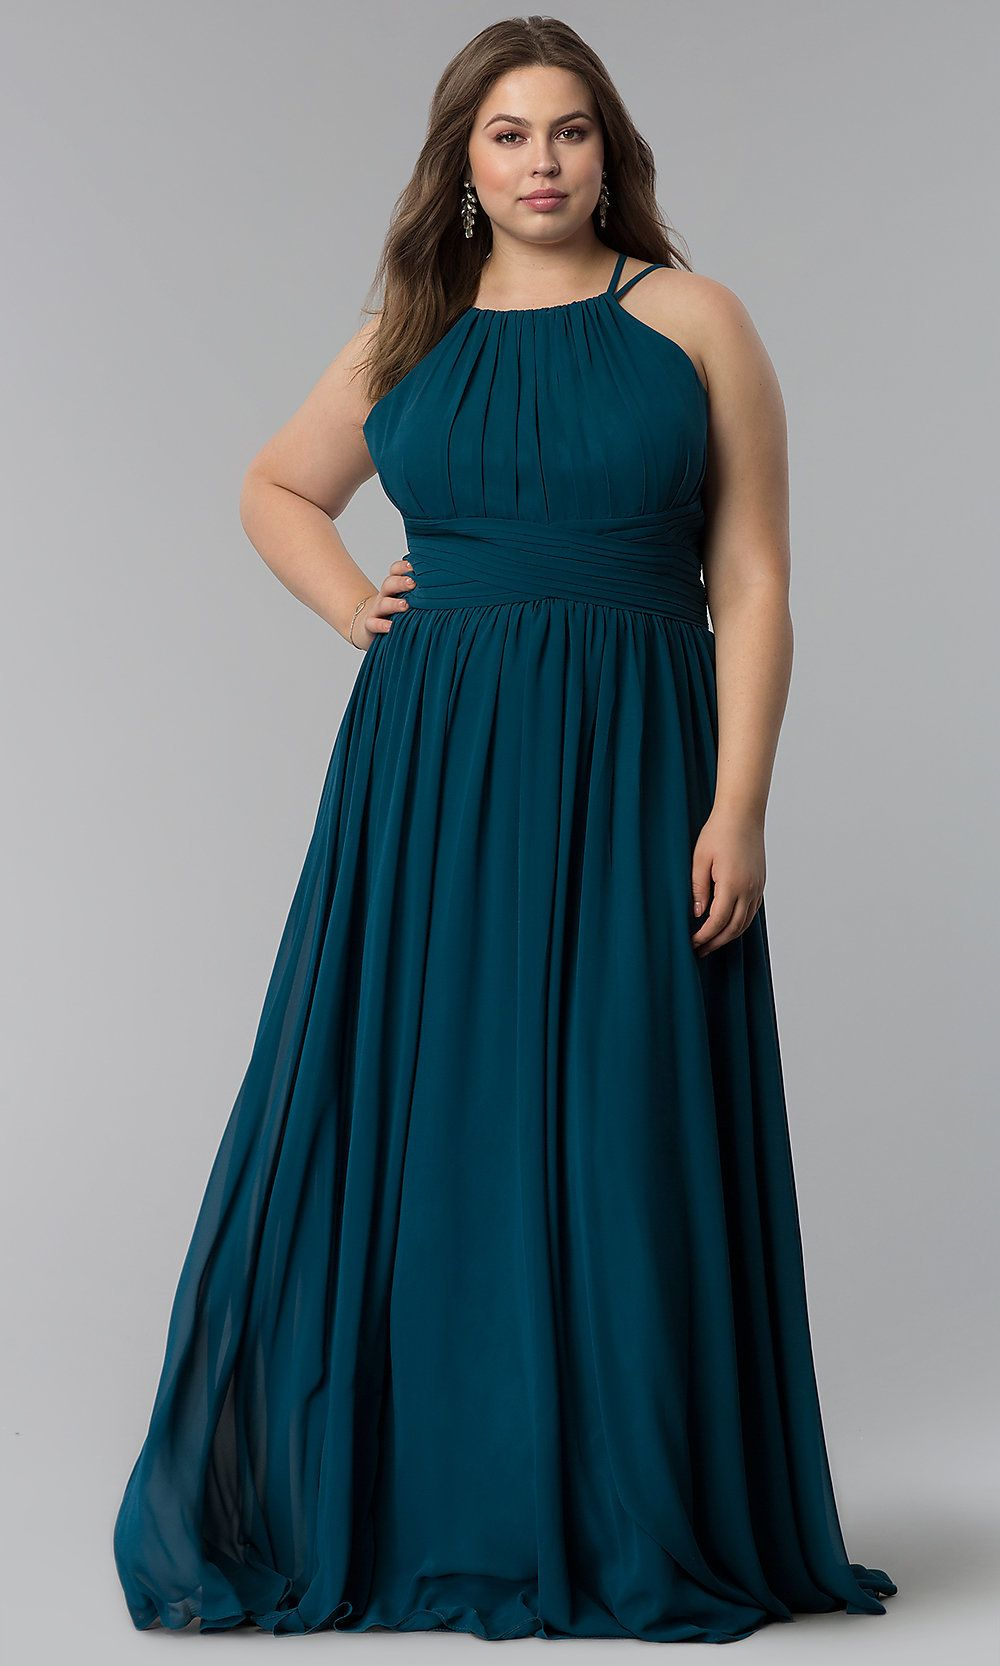 High-Neck Long Plus-Size Prom Dress - PromGirl